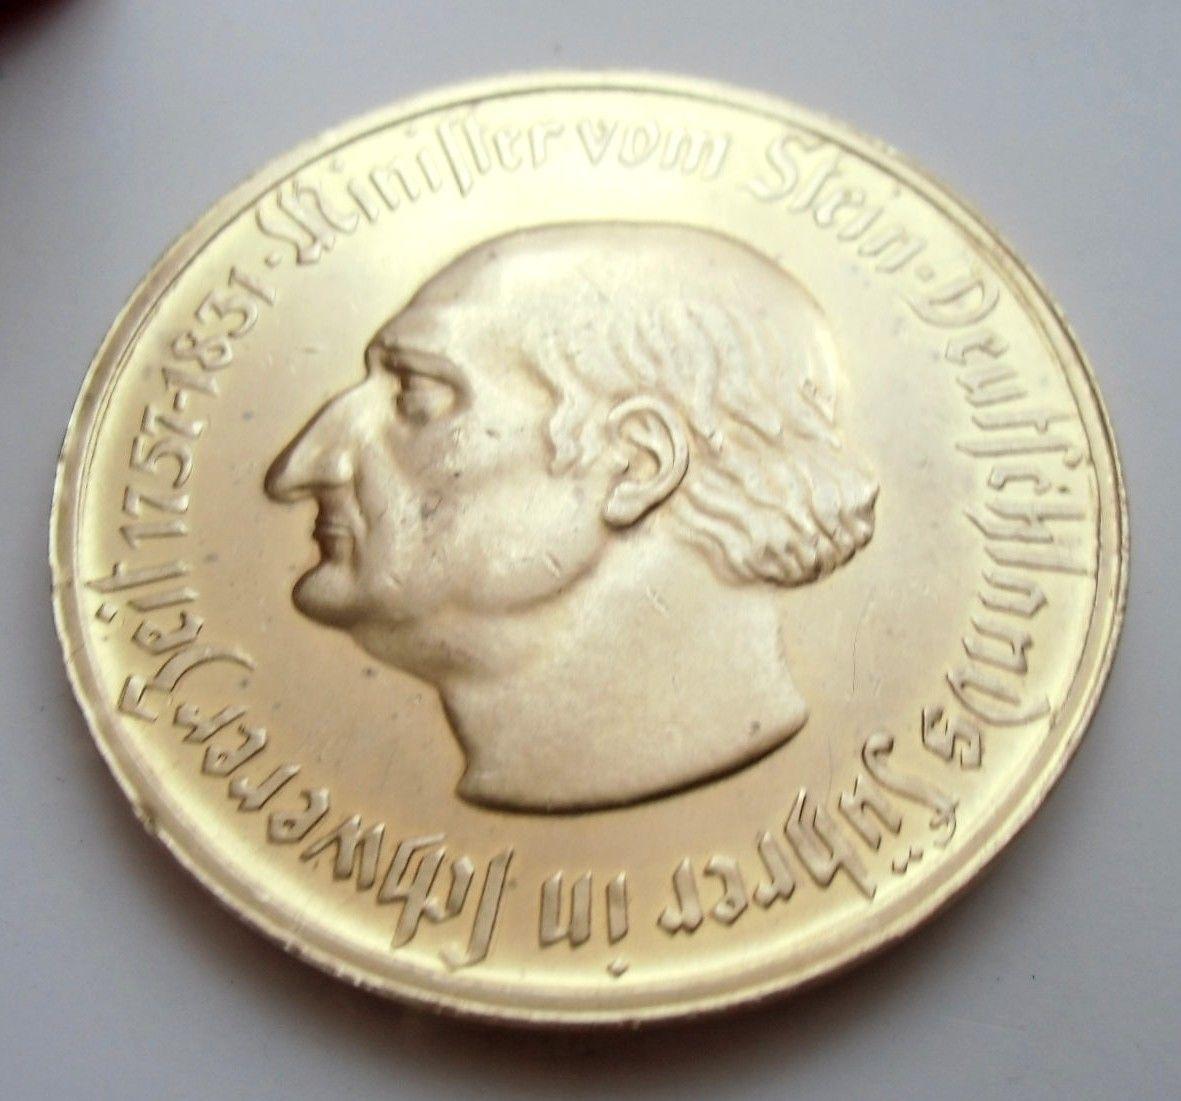 Monedas de emergencia emitidas por el banco regional de Westphalia 1923_50ma